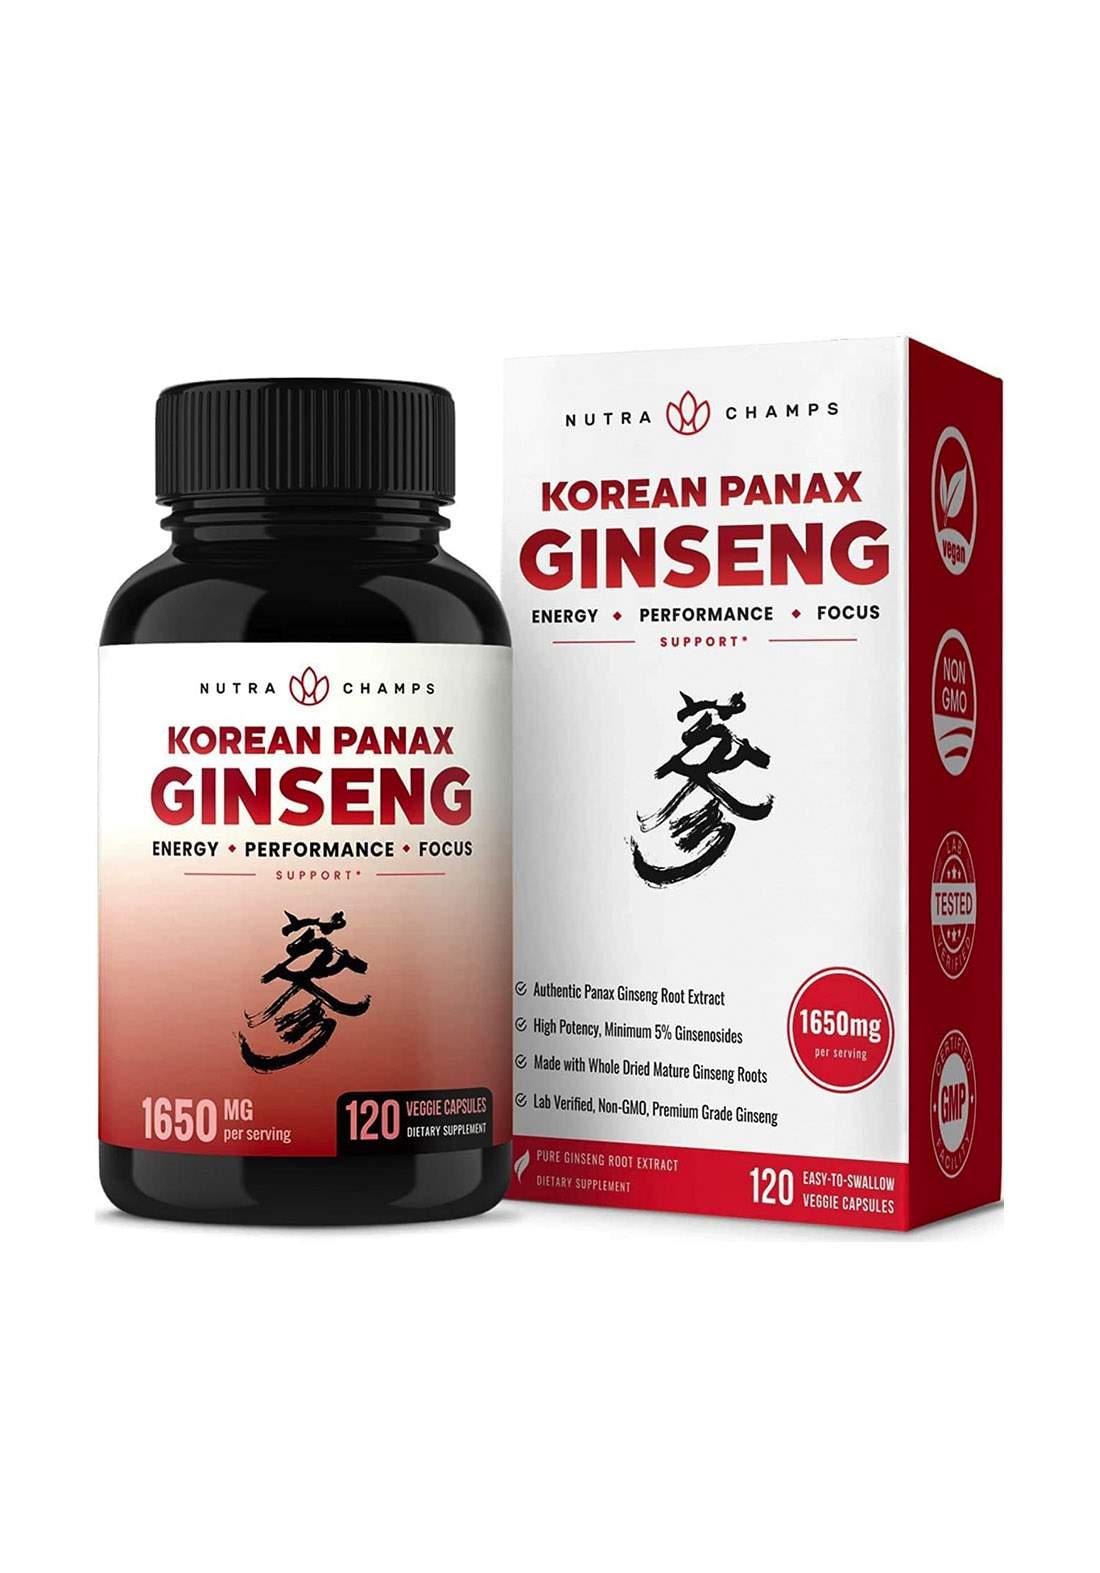 Nutra Champs Korean Panax Ginseng (1650 mg ) 120 Vegan Capsules مكمل غذائي 120 كبسولة